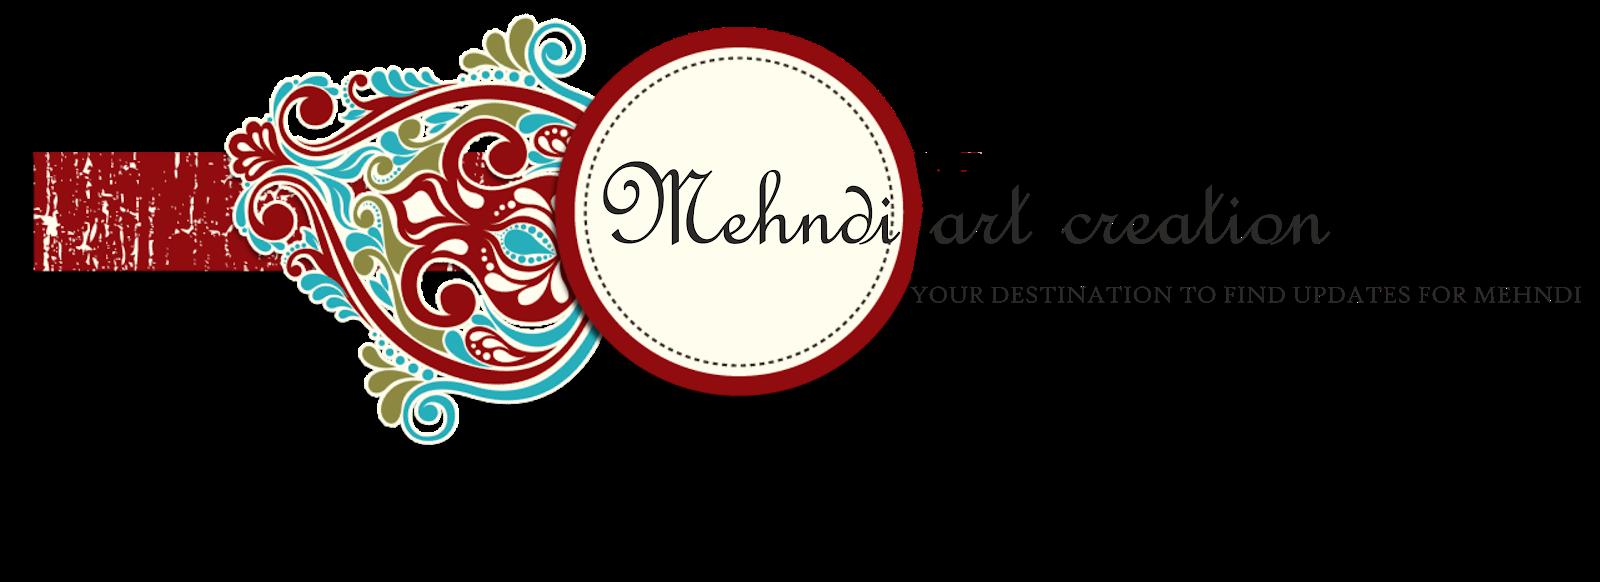 arabic mehndi designs for hands step by step | Mehndi art creation